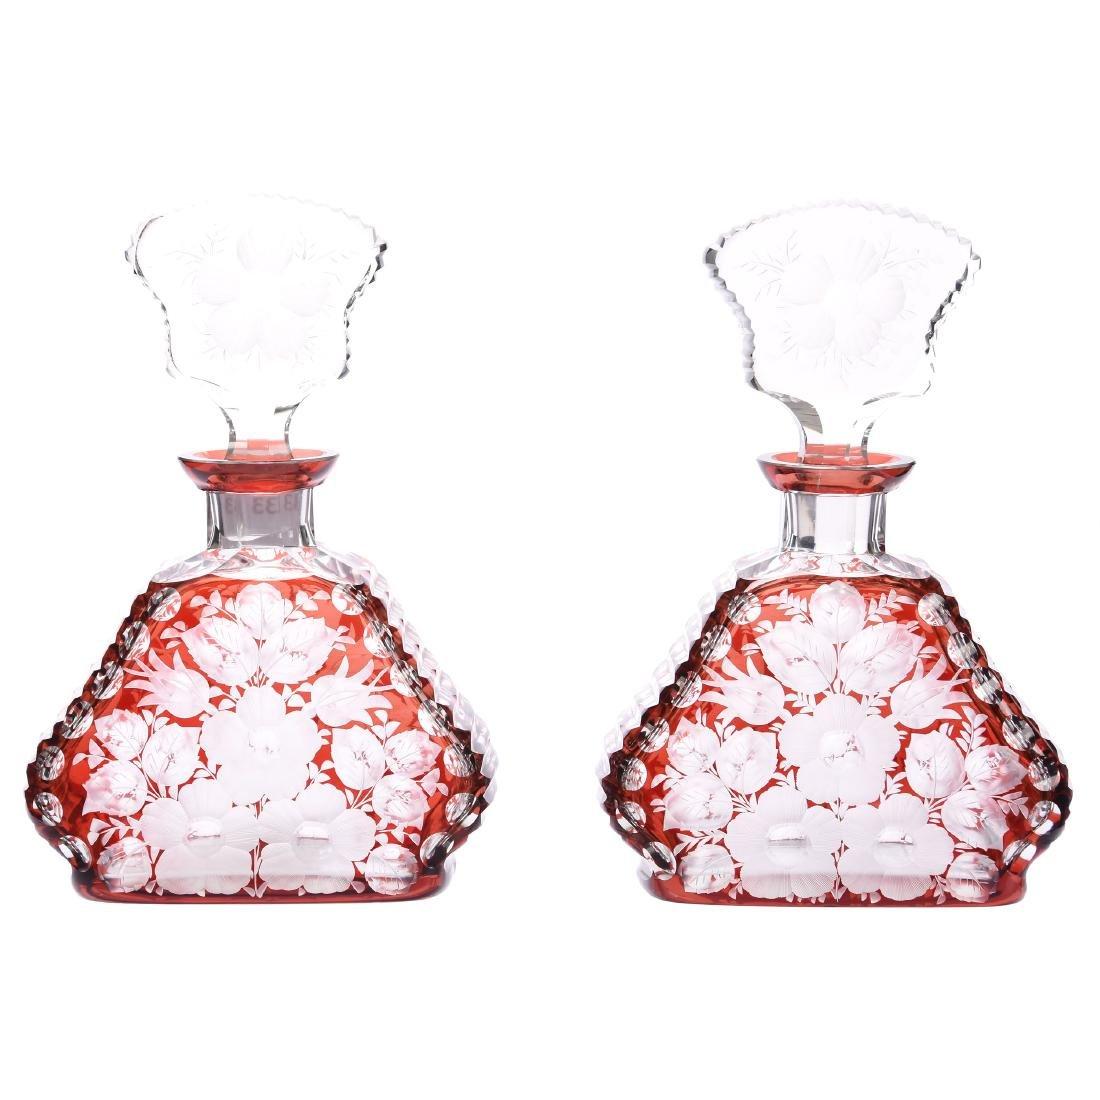 Pair Colognes, Engraved Floral Design